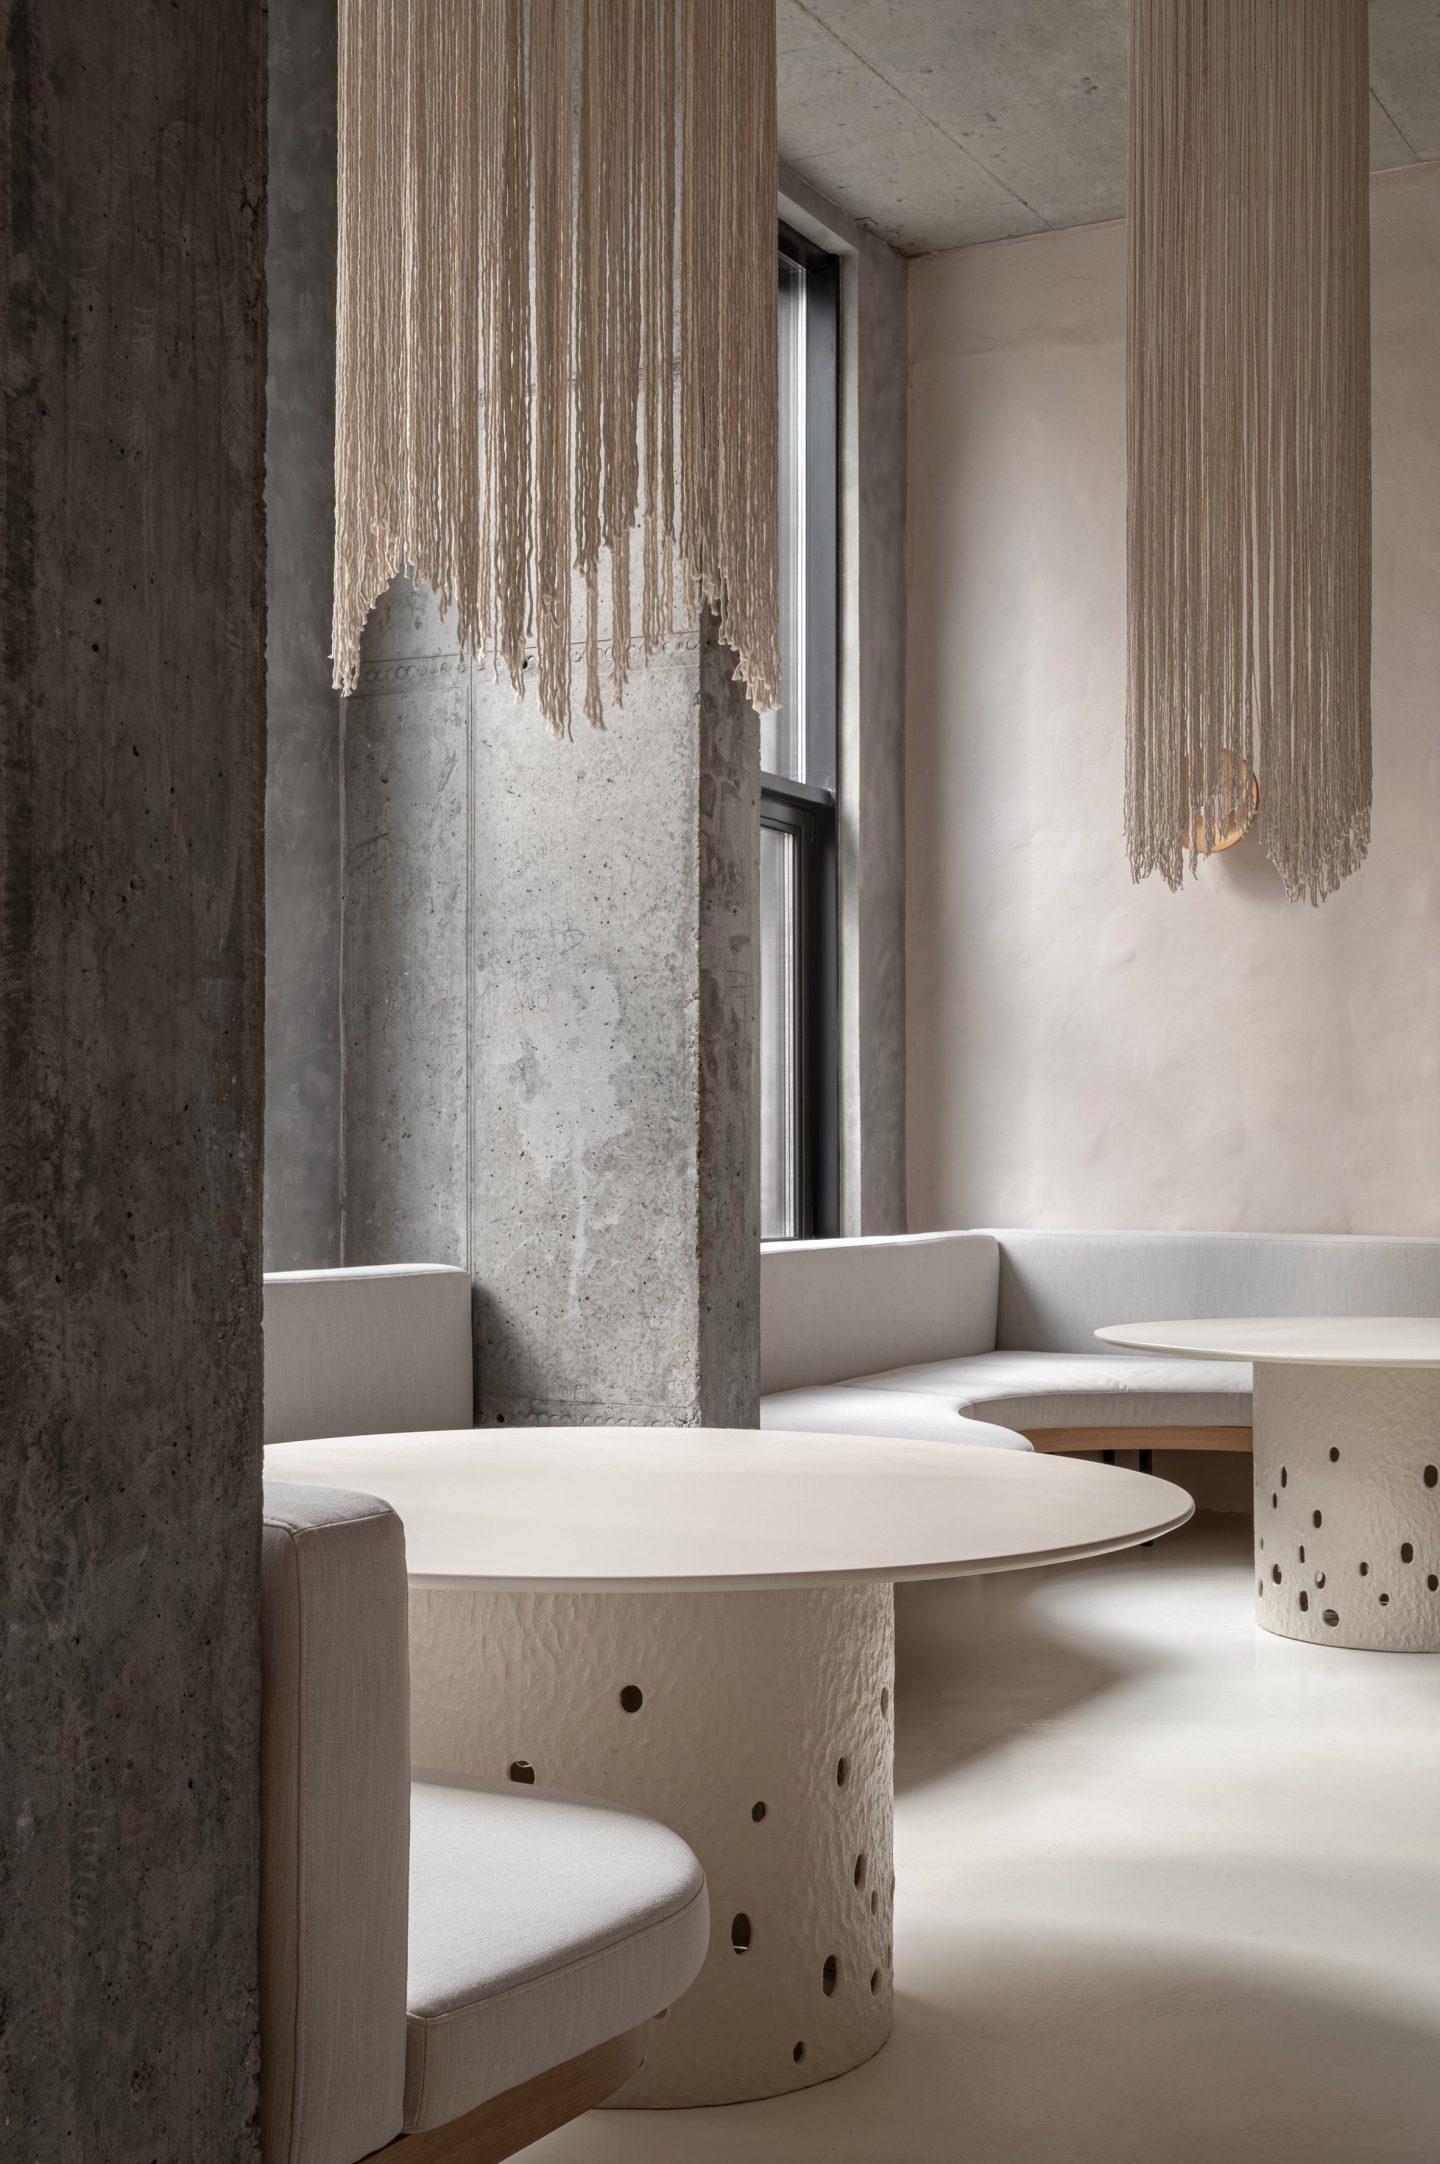 IGNANT-Design-Interior-Istetyka-2